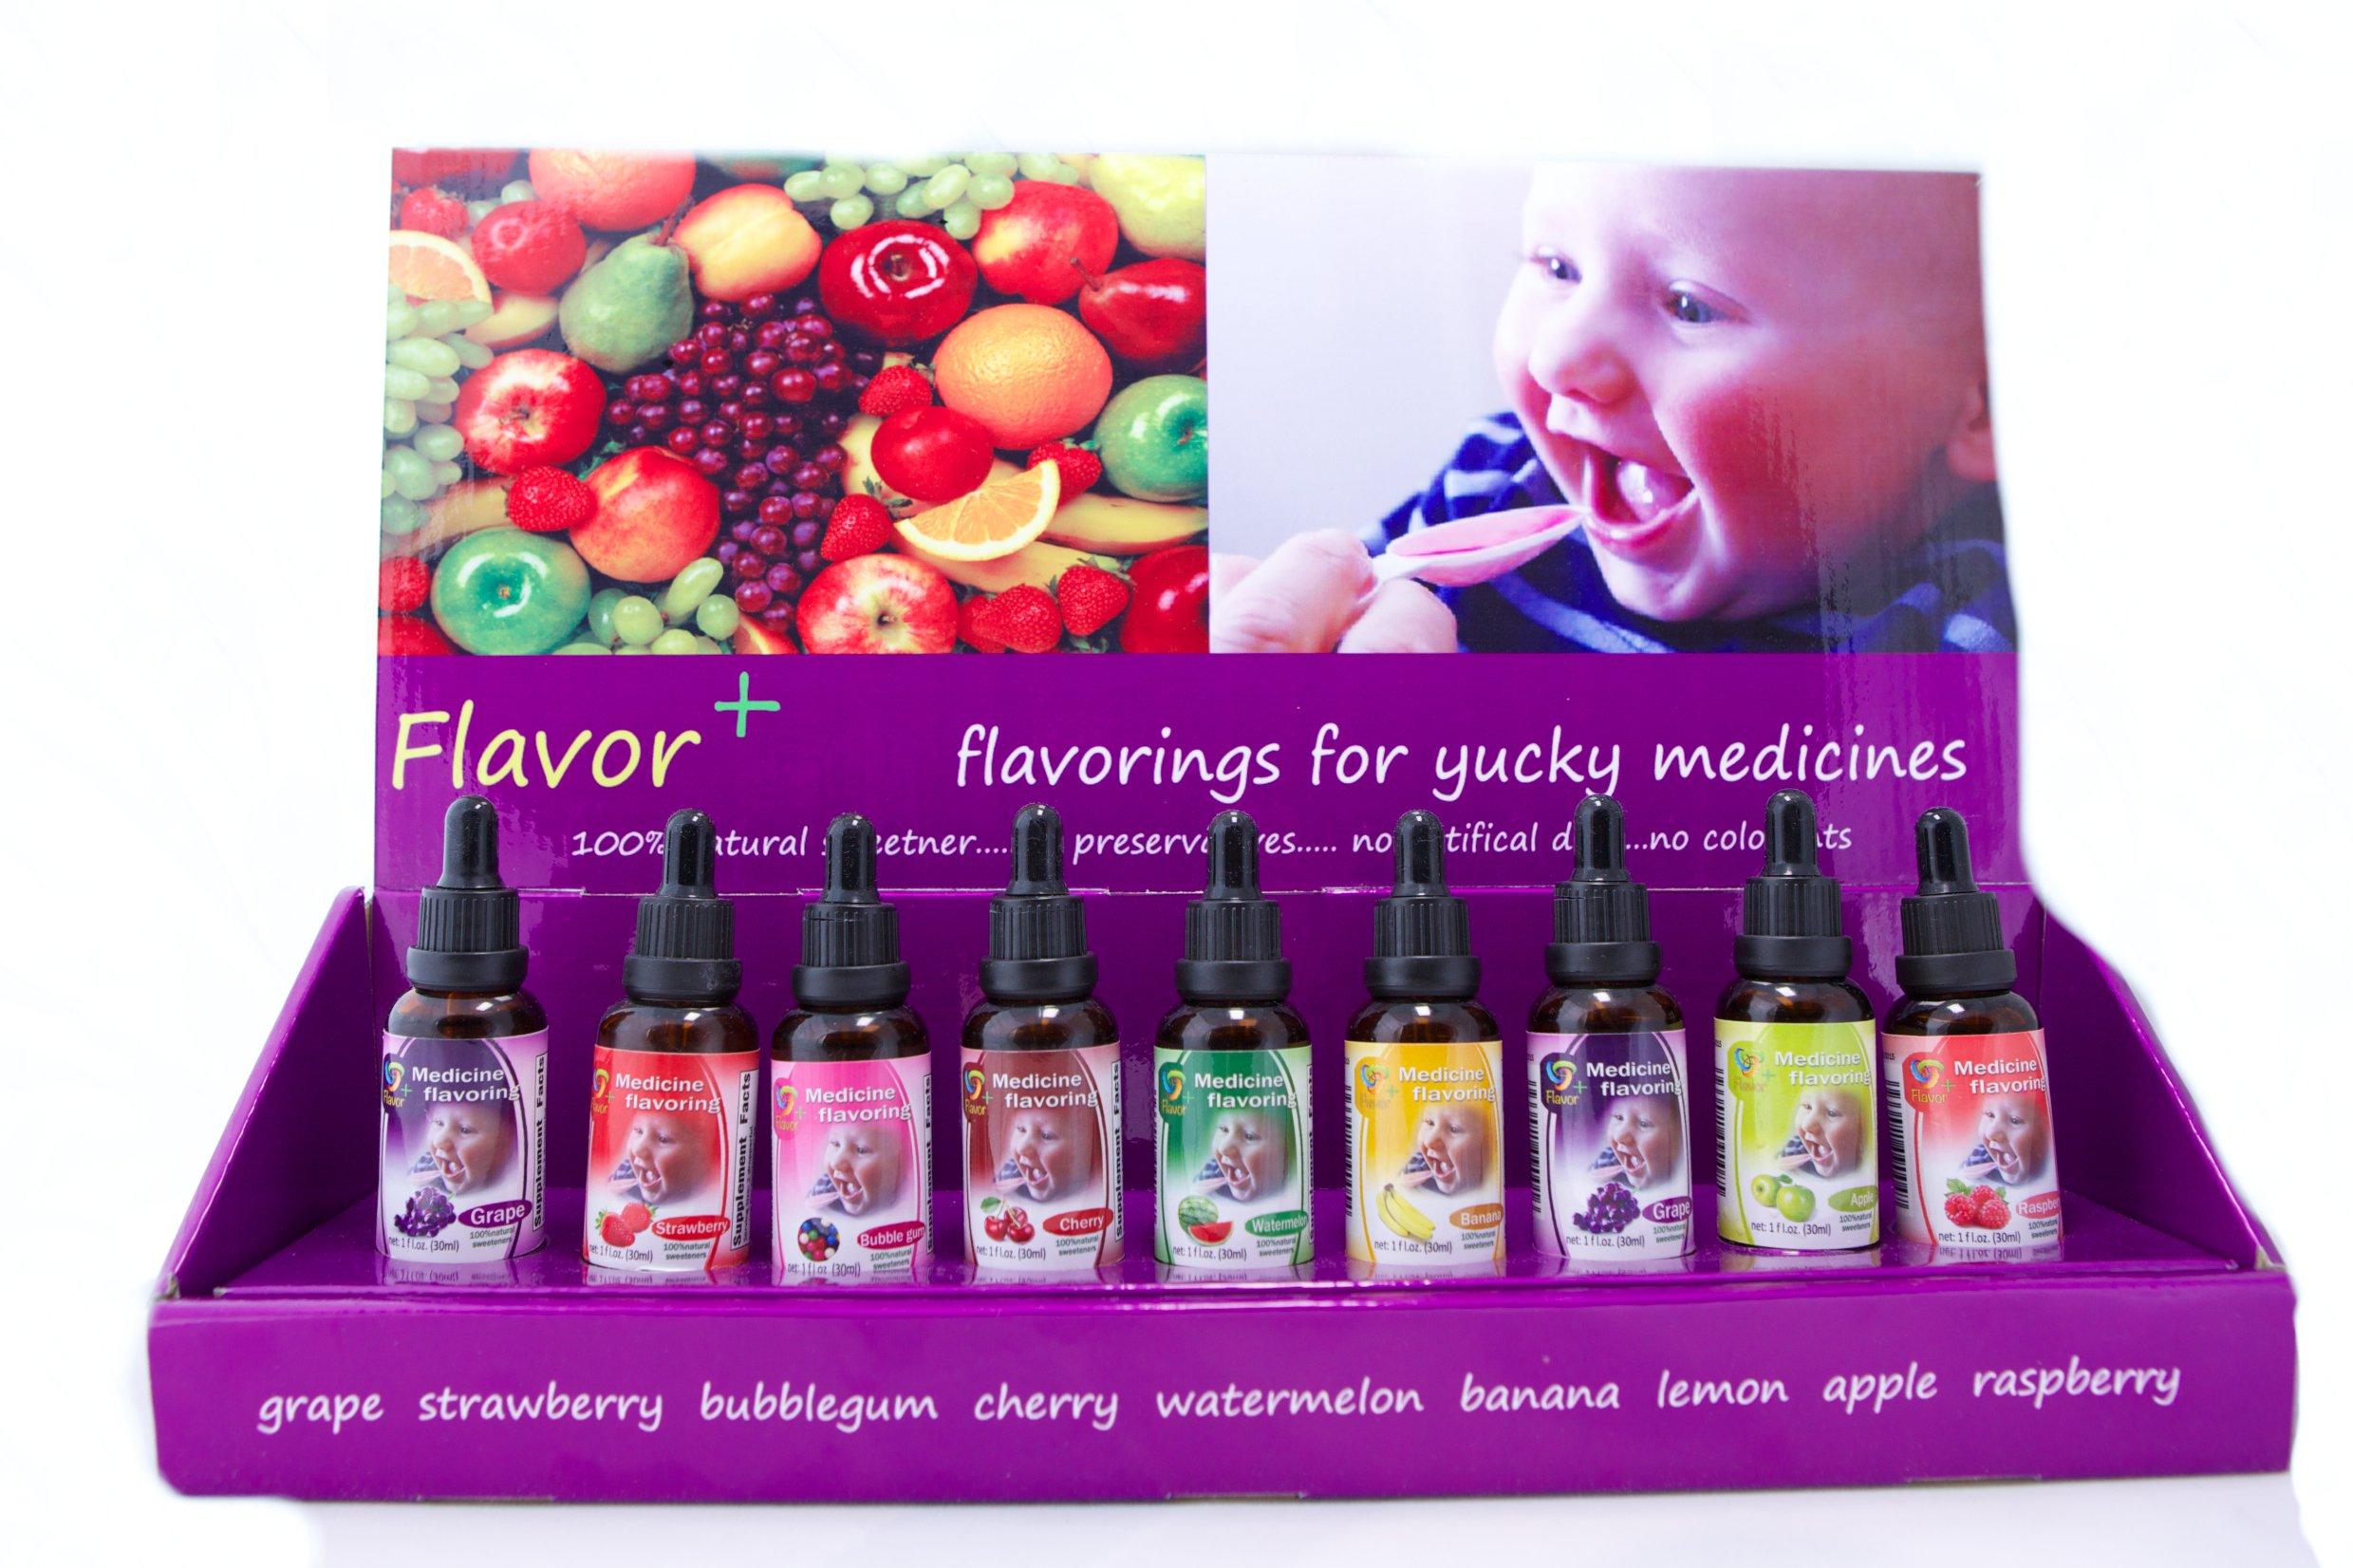 Pharmacy Flavoring Kit Prescription Vials Flavor Drops Pharmacist Rx Pediatrician Urgent Care Dentist Health Care Supply Fruit Flavors for Drugs Medication Flavors Home Flavoring Kit